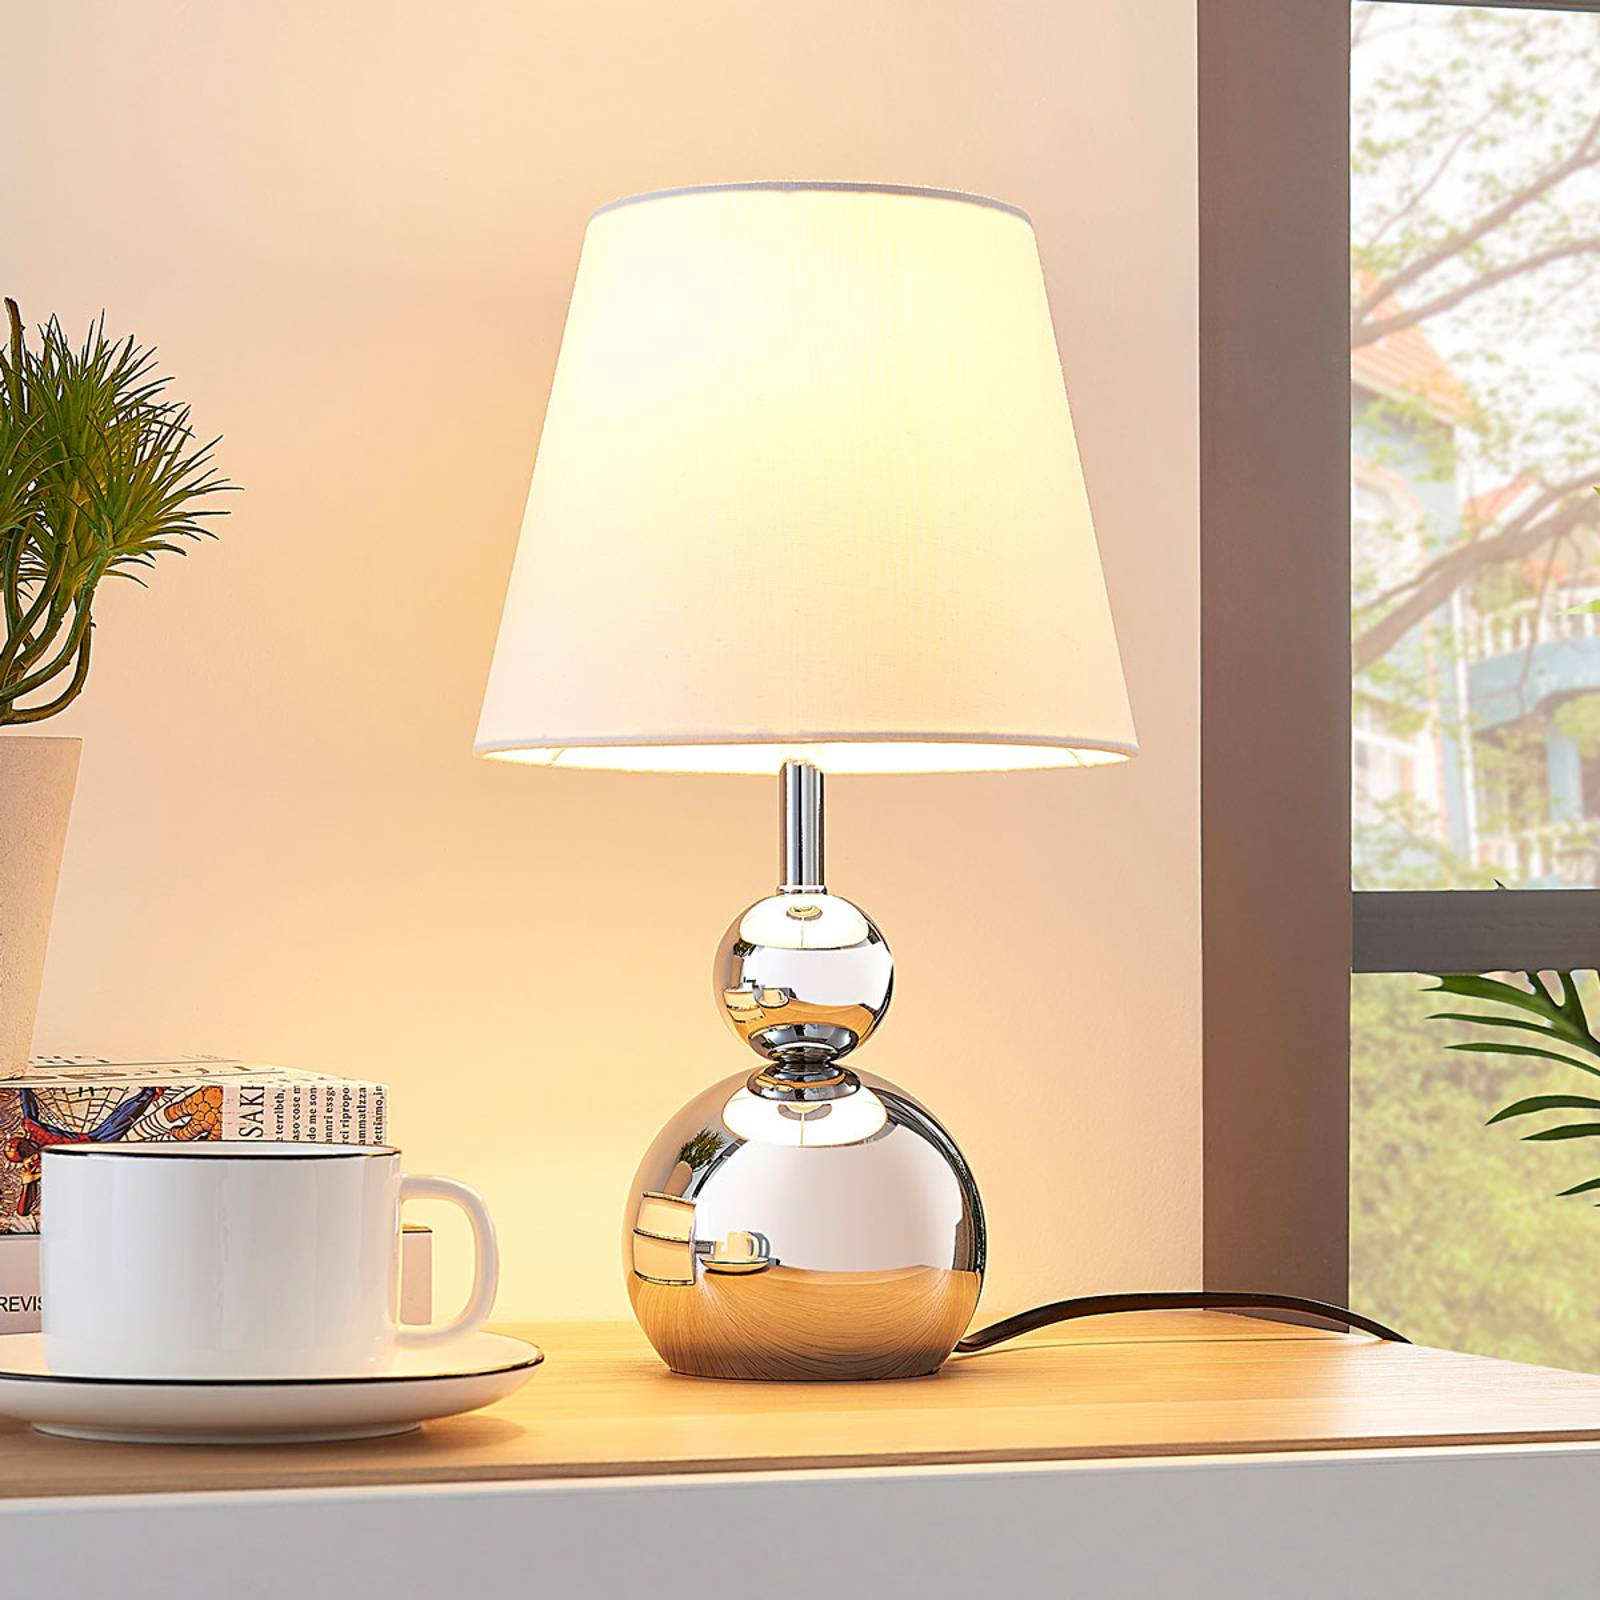 Witte stoffen tafellamp Andor met chromen voet